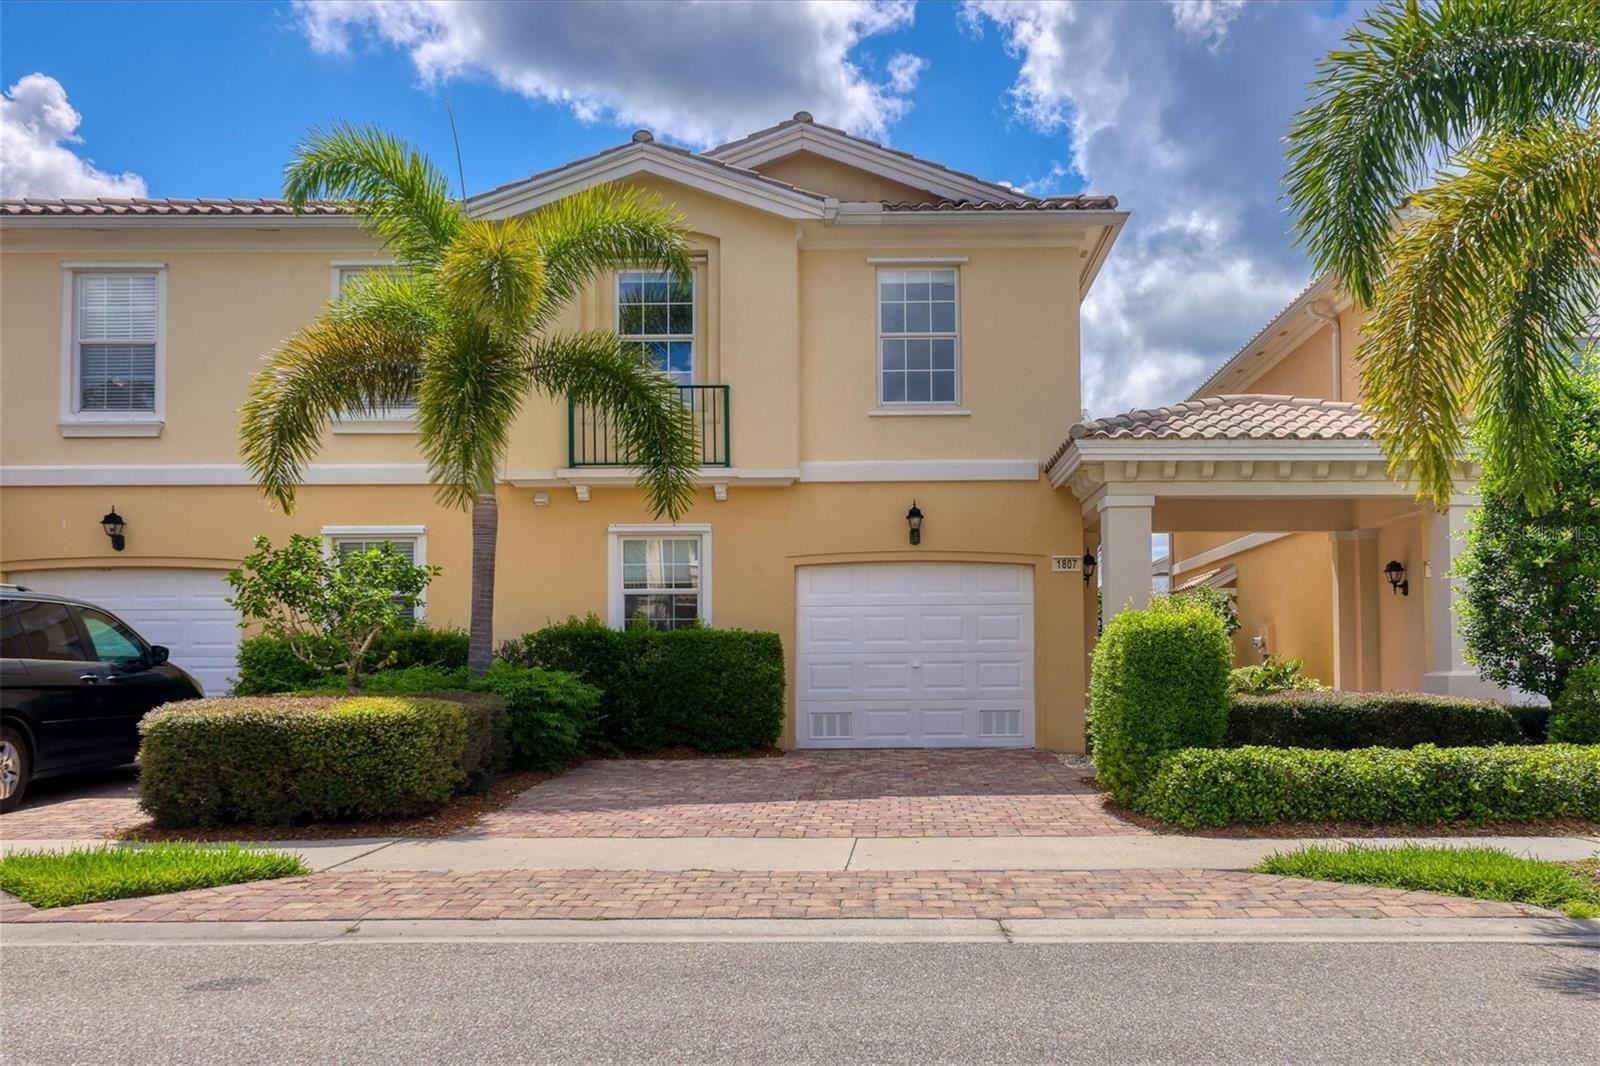 1807 BURGOS DRIVE, Sarasota, FL 34238 - #: A4508846